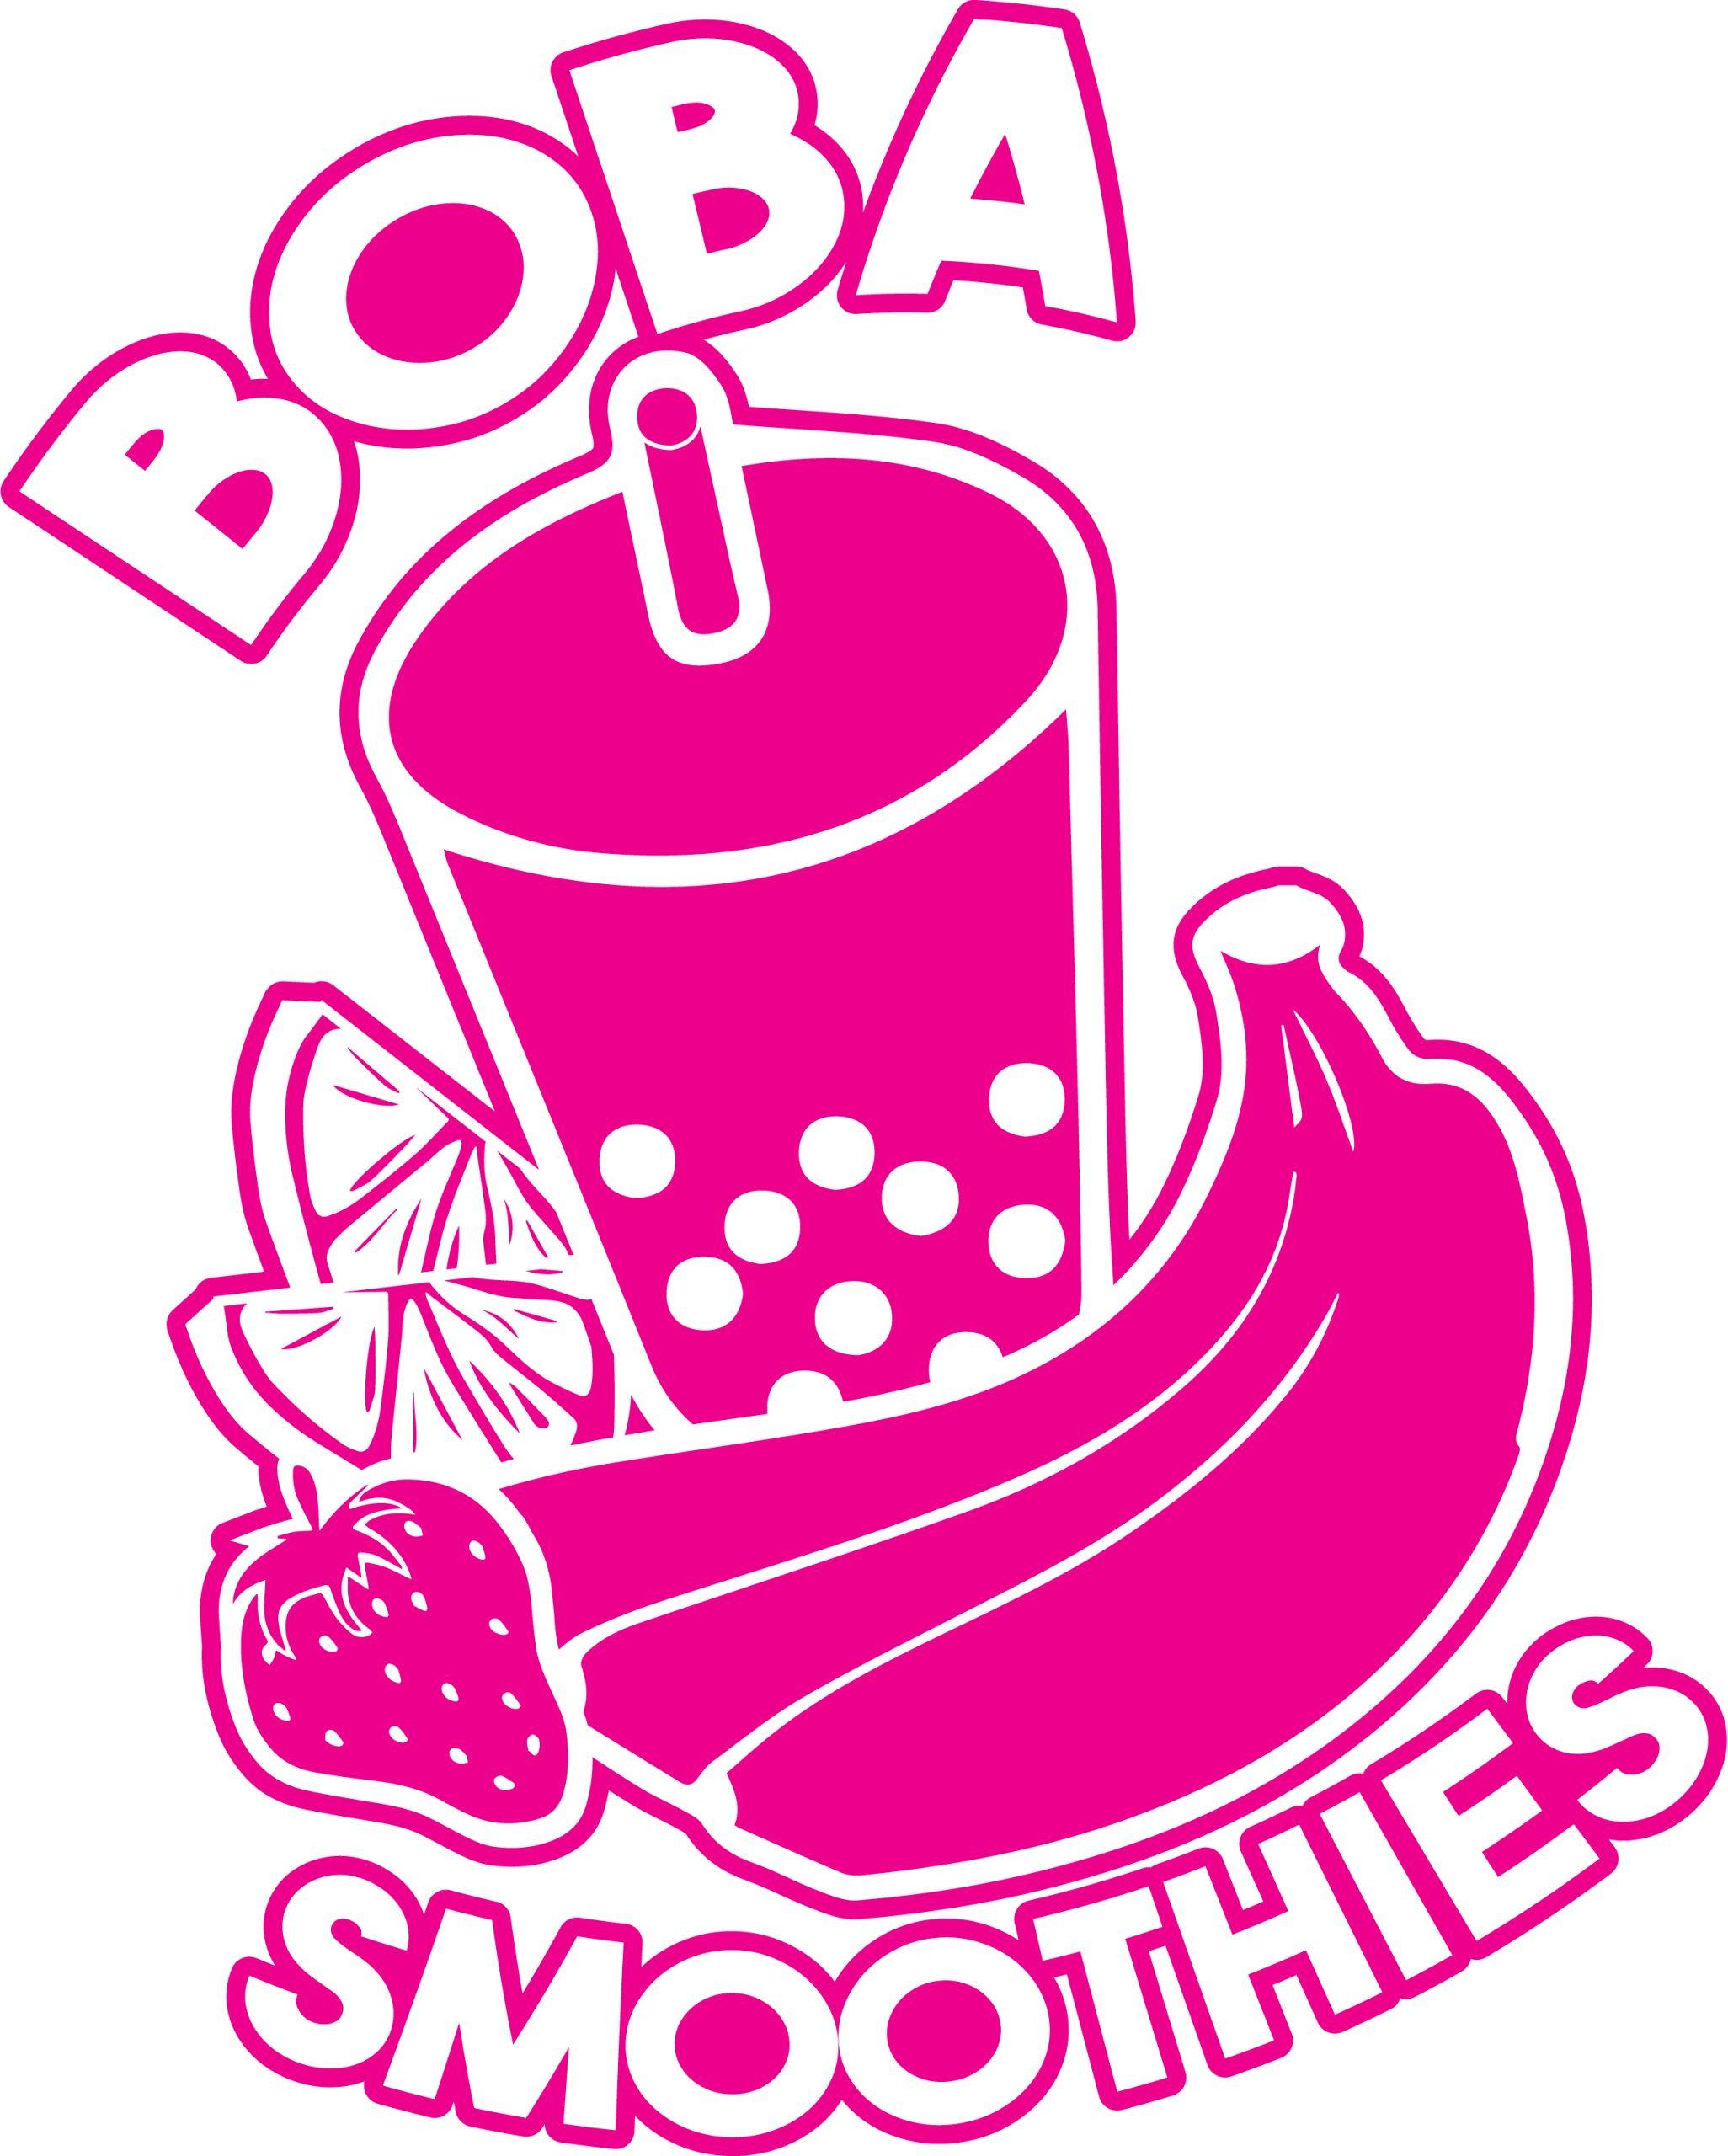 Boba Smoothies T Shirt Design